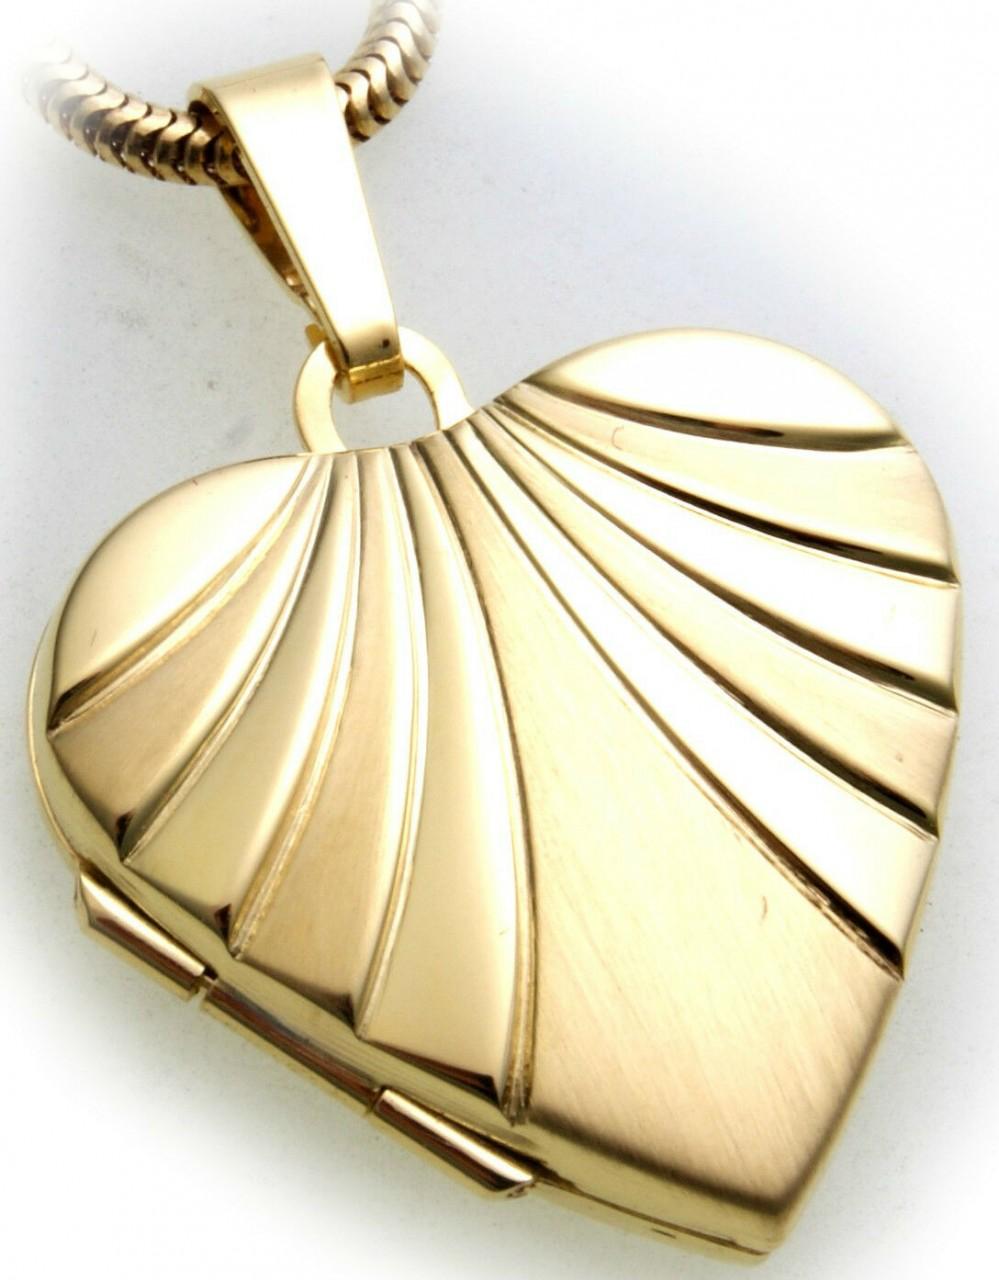 Anhänger Medaillon Herz in echt Gold 333 Gelbgold zum klappen 8 Karat Damen